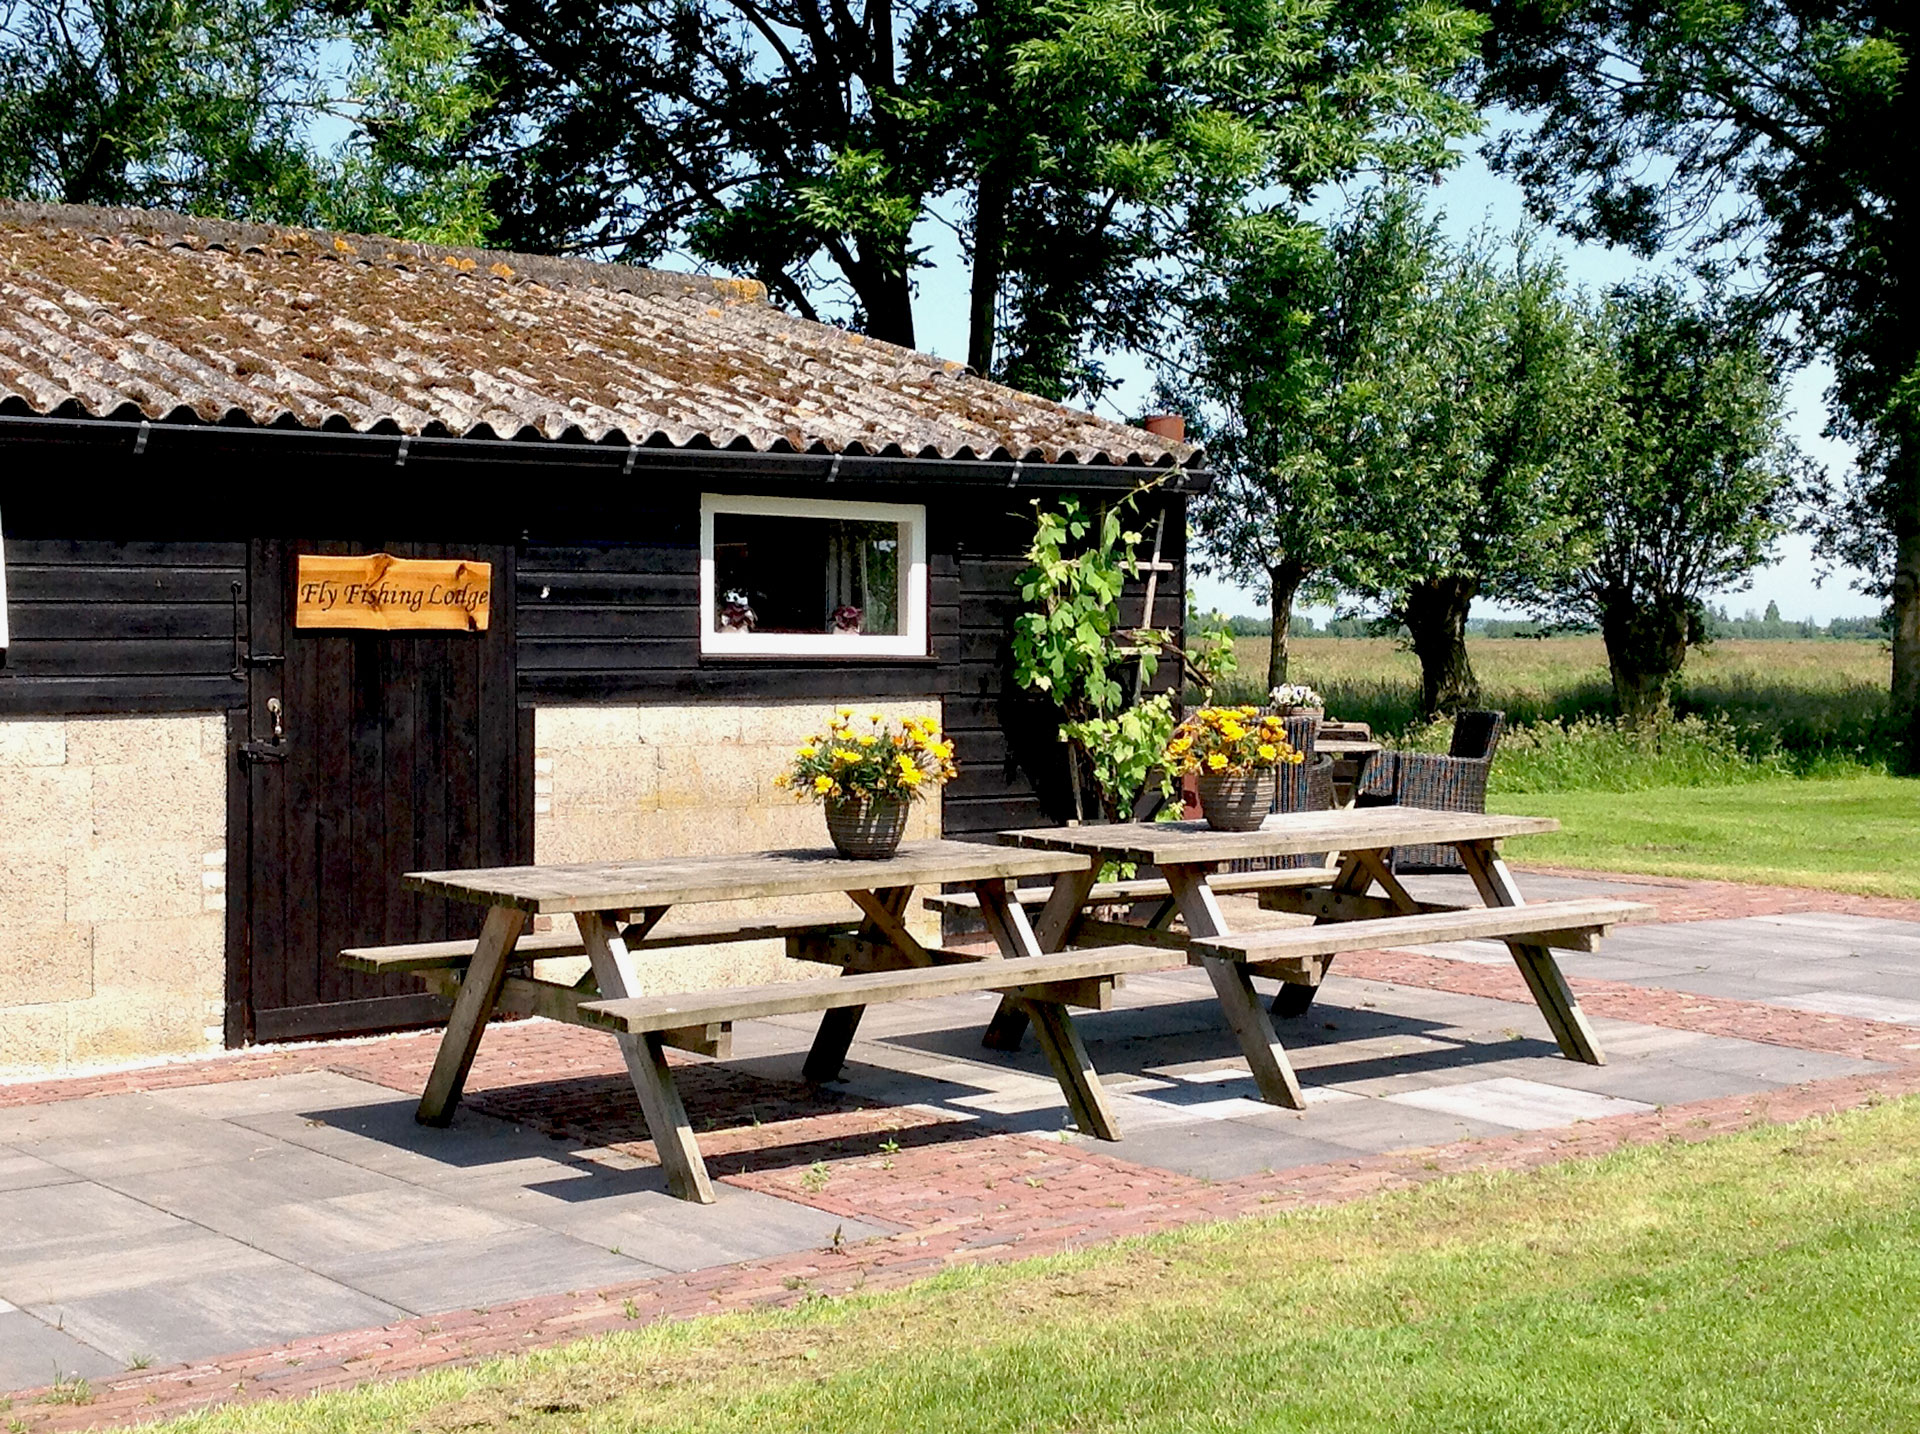 Fly Fishing Lodge